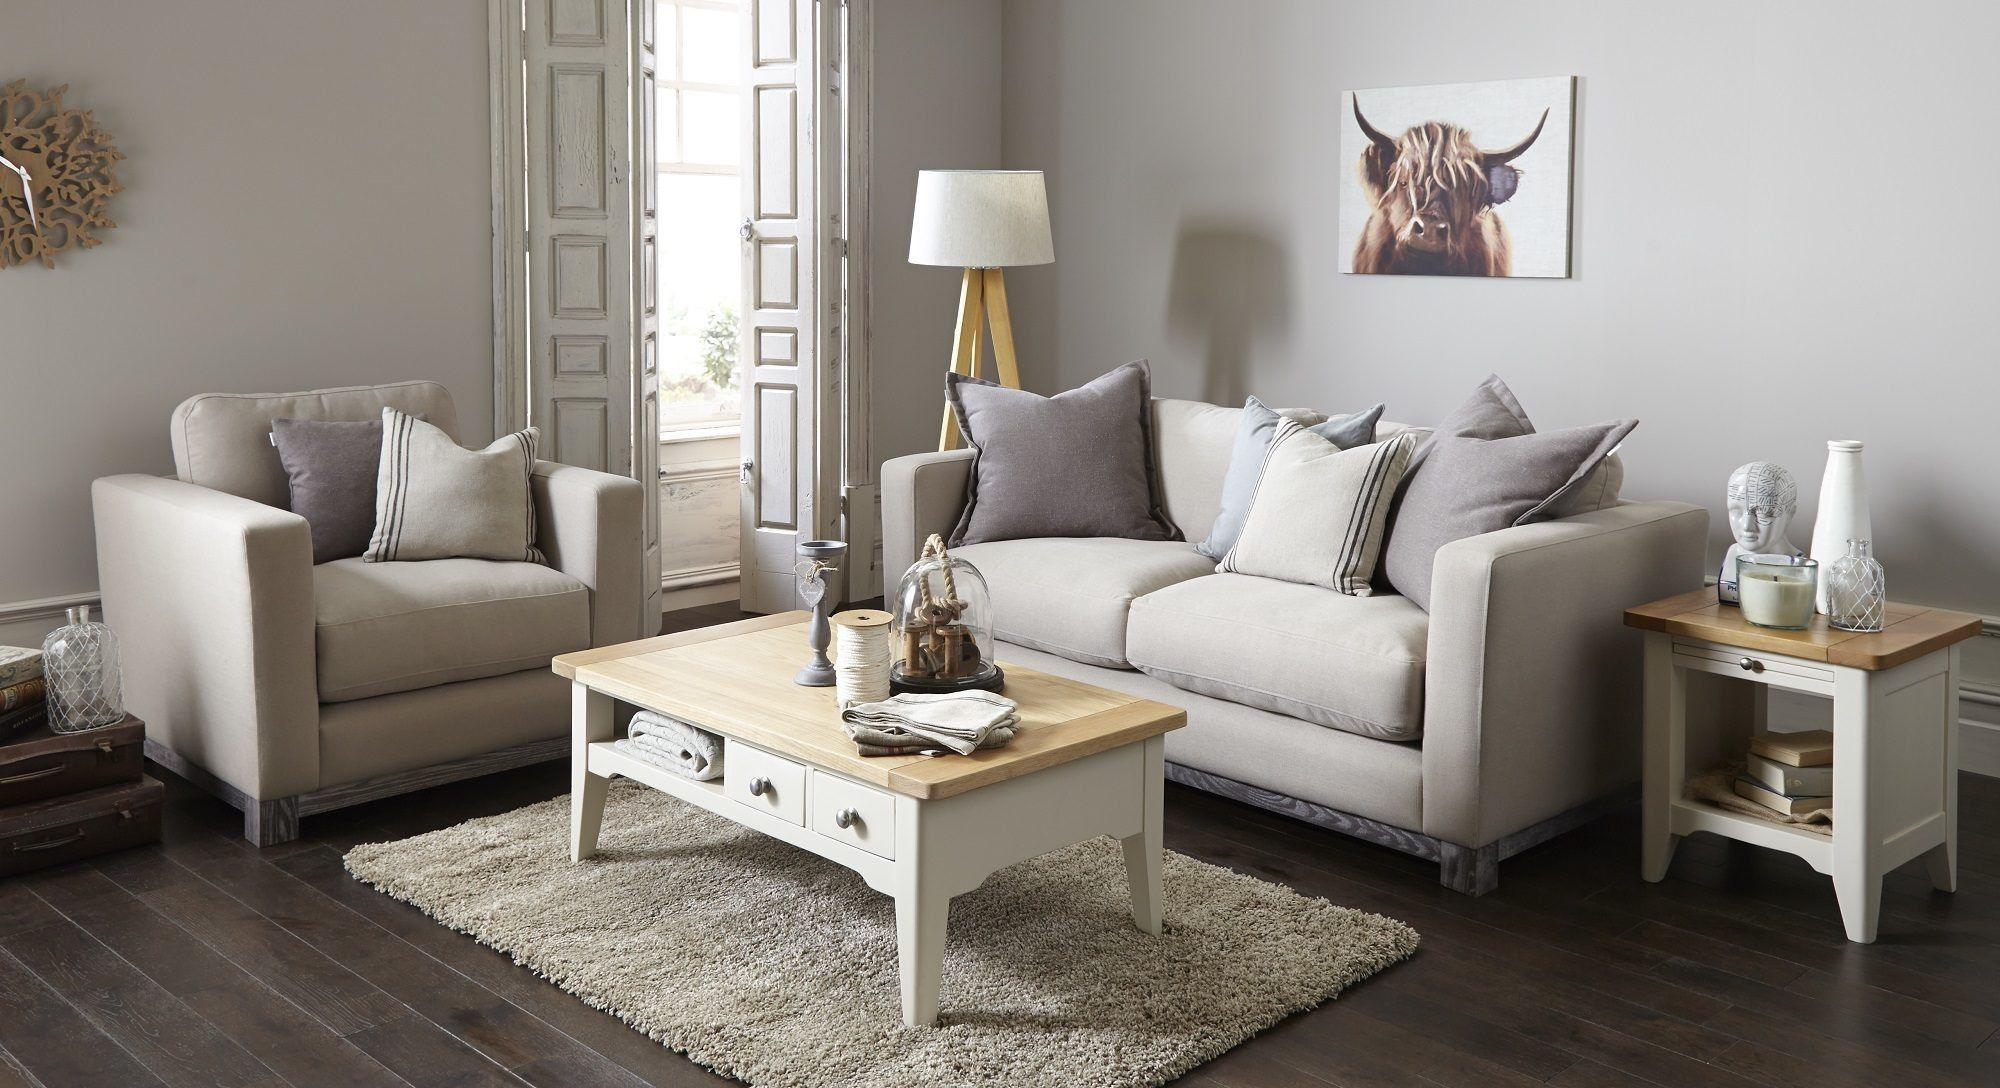 Modern Living Room Ideas Uk Home Ideas 2018 Cosy Living Room Living Room Ideas Uk Cosy Living Room Decor